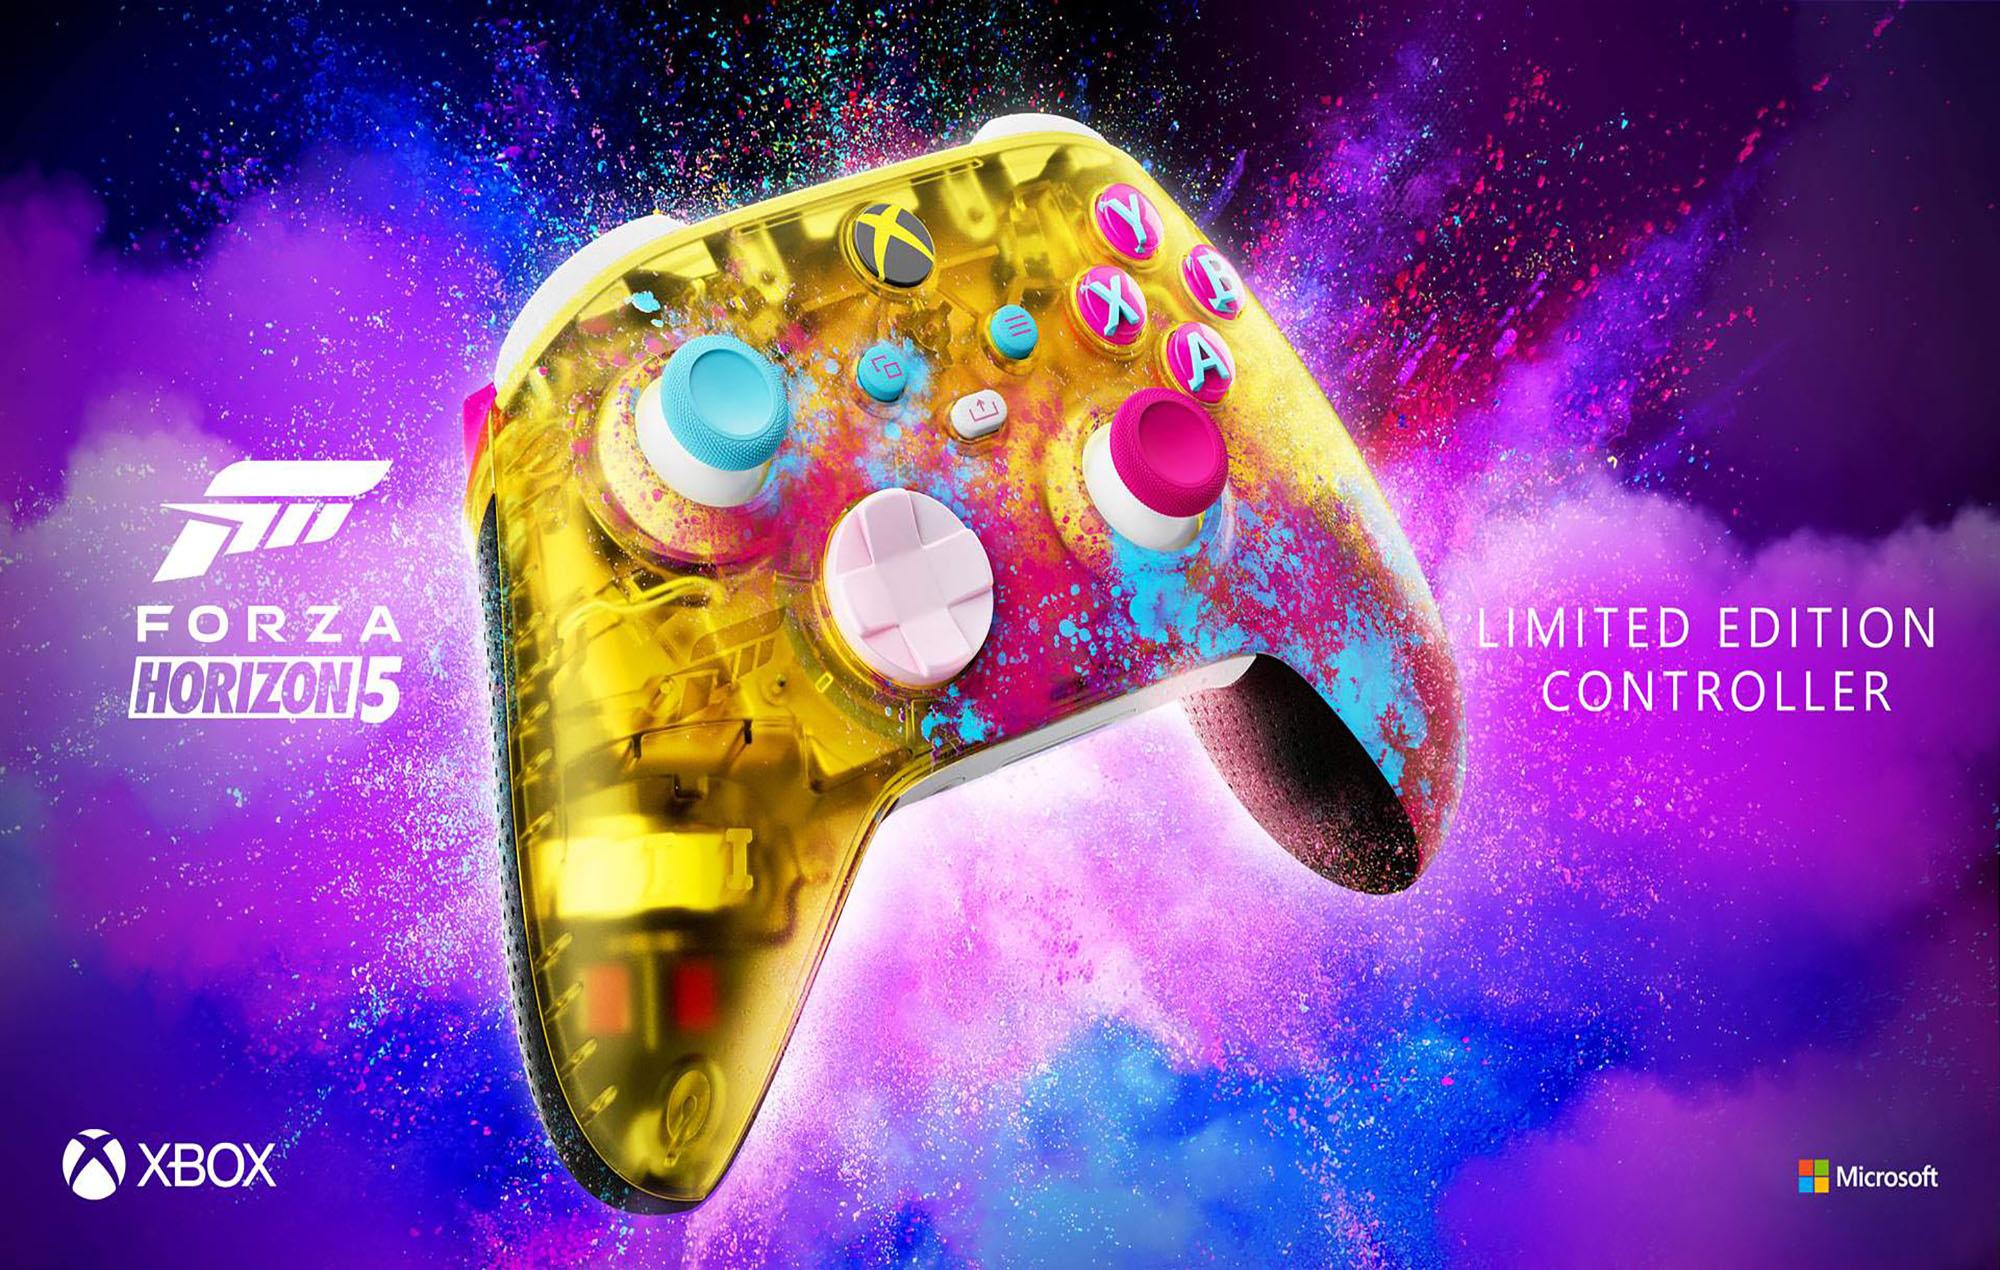 Forza Horizon 5 controller. Image credit: Microsoft